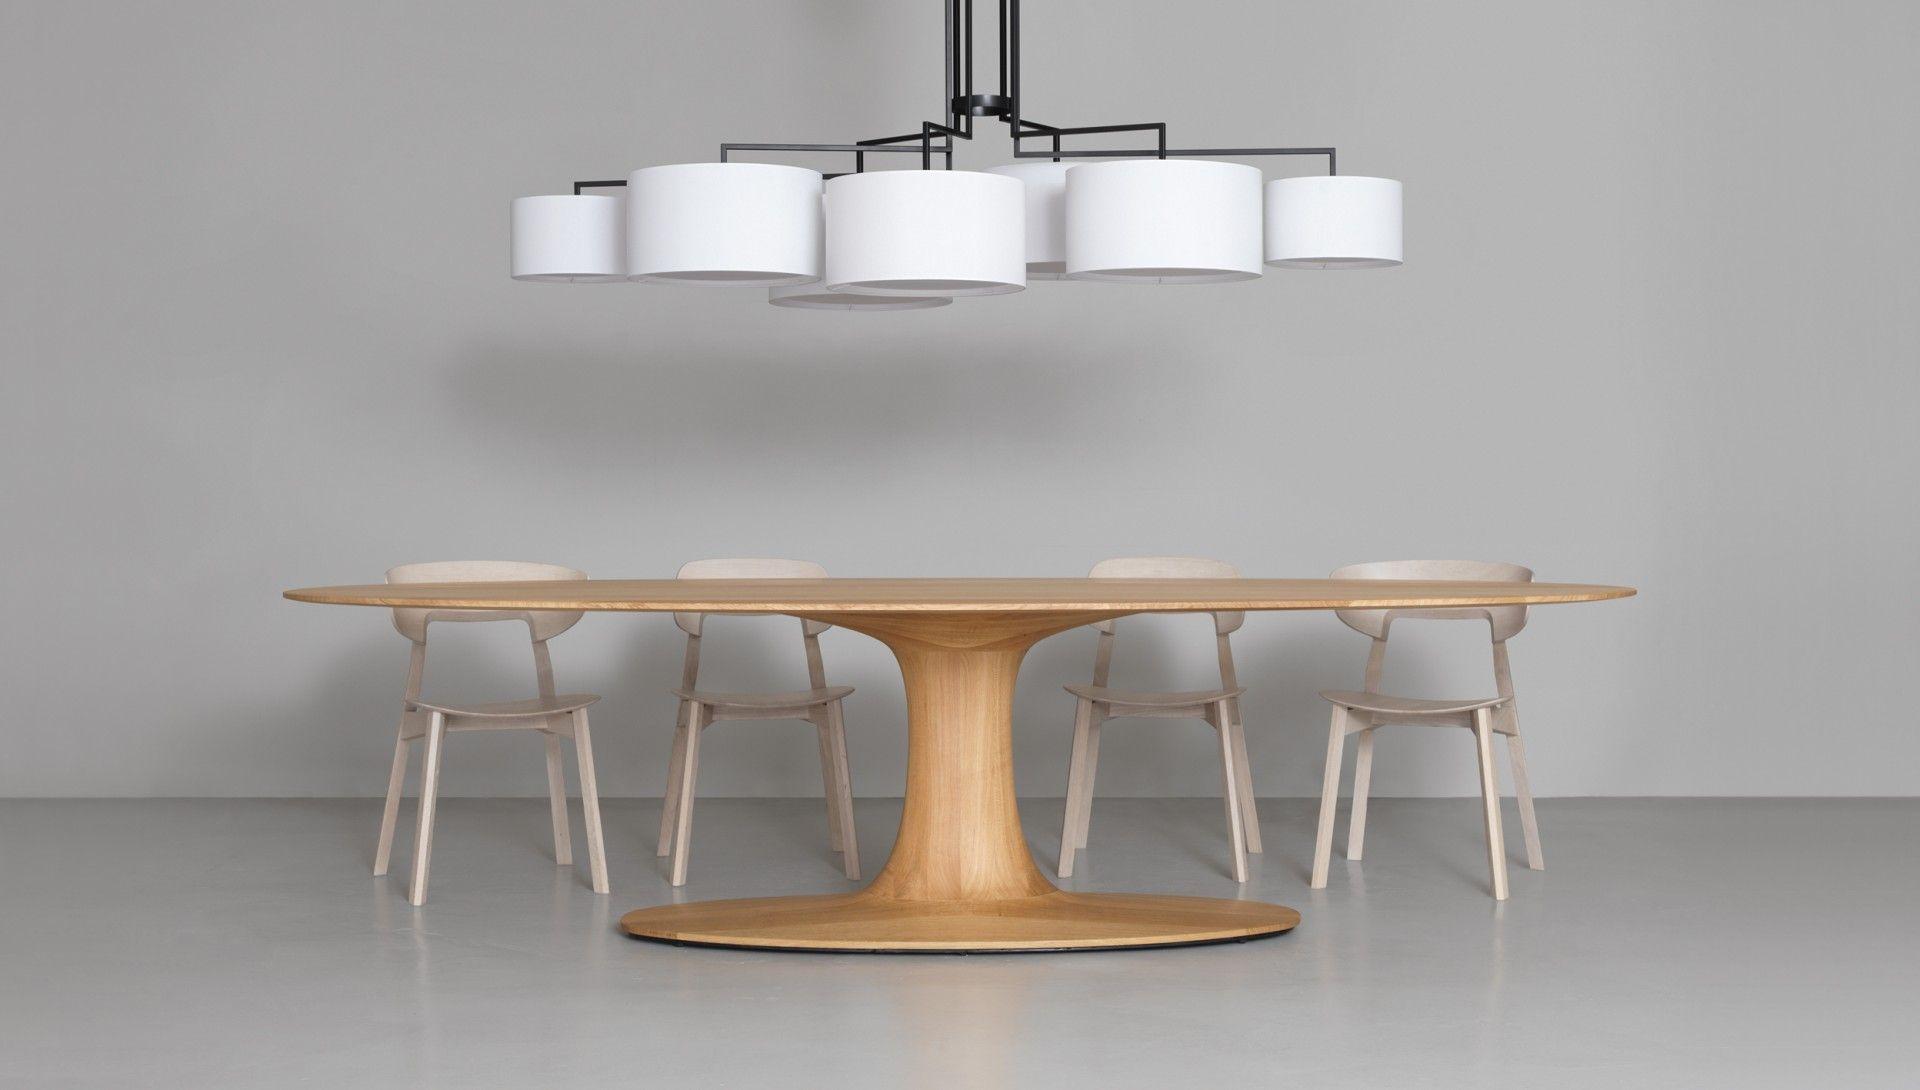 Turntable Oval Dining Room Furniture Modern Interior Furniture